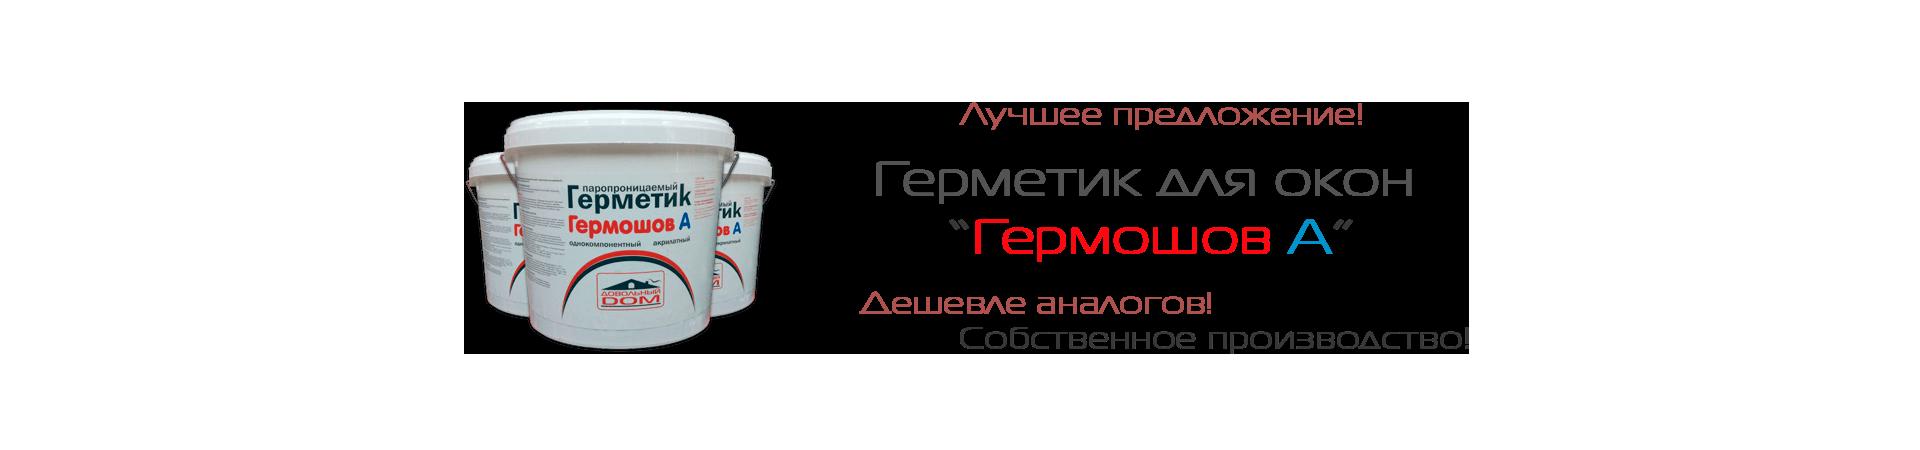 germoshov-a